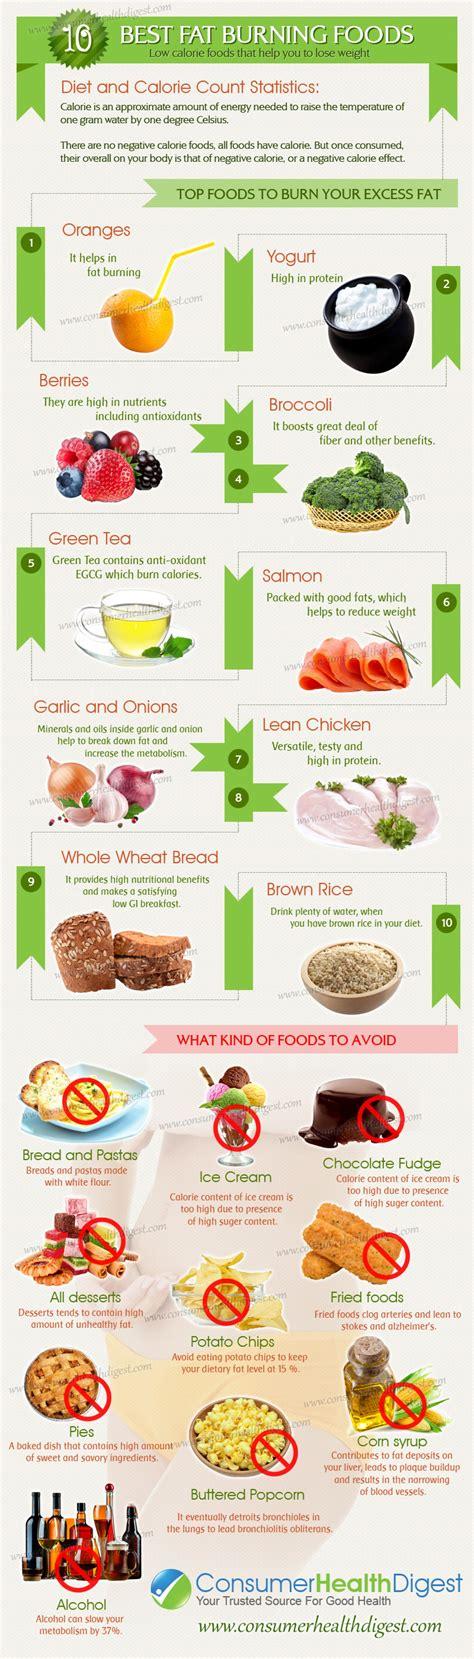 top 10 foods 10 best burning foods infographic